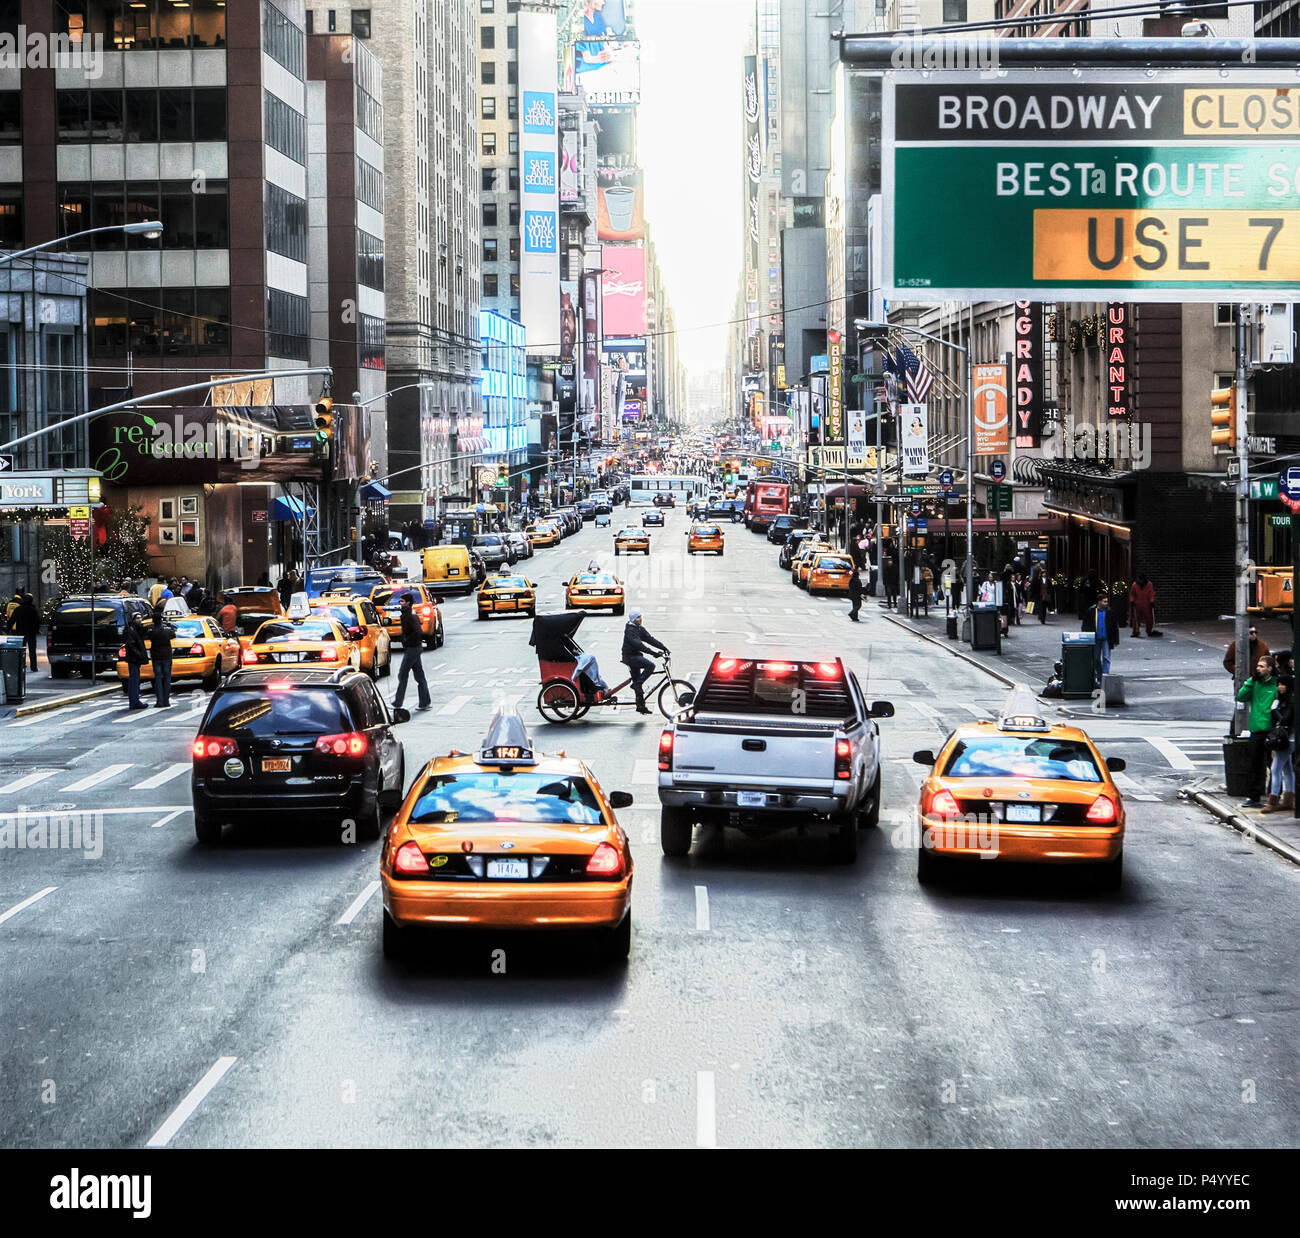 Straße in New York, Manhattan. Stockbild